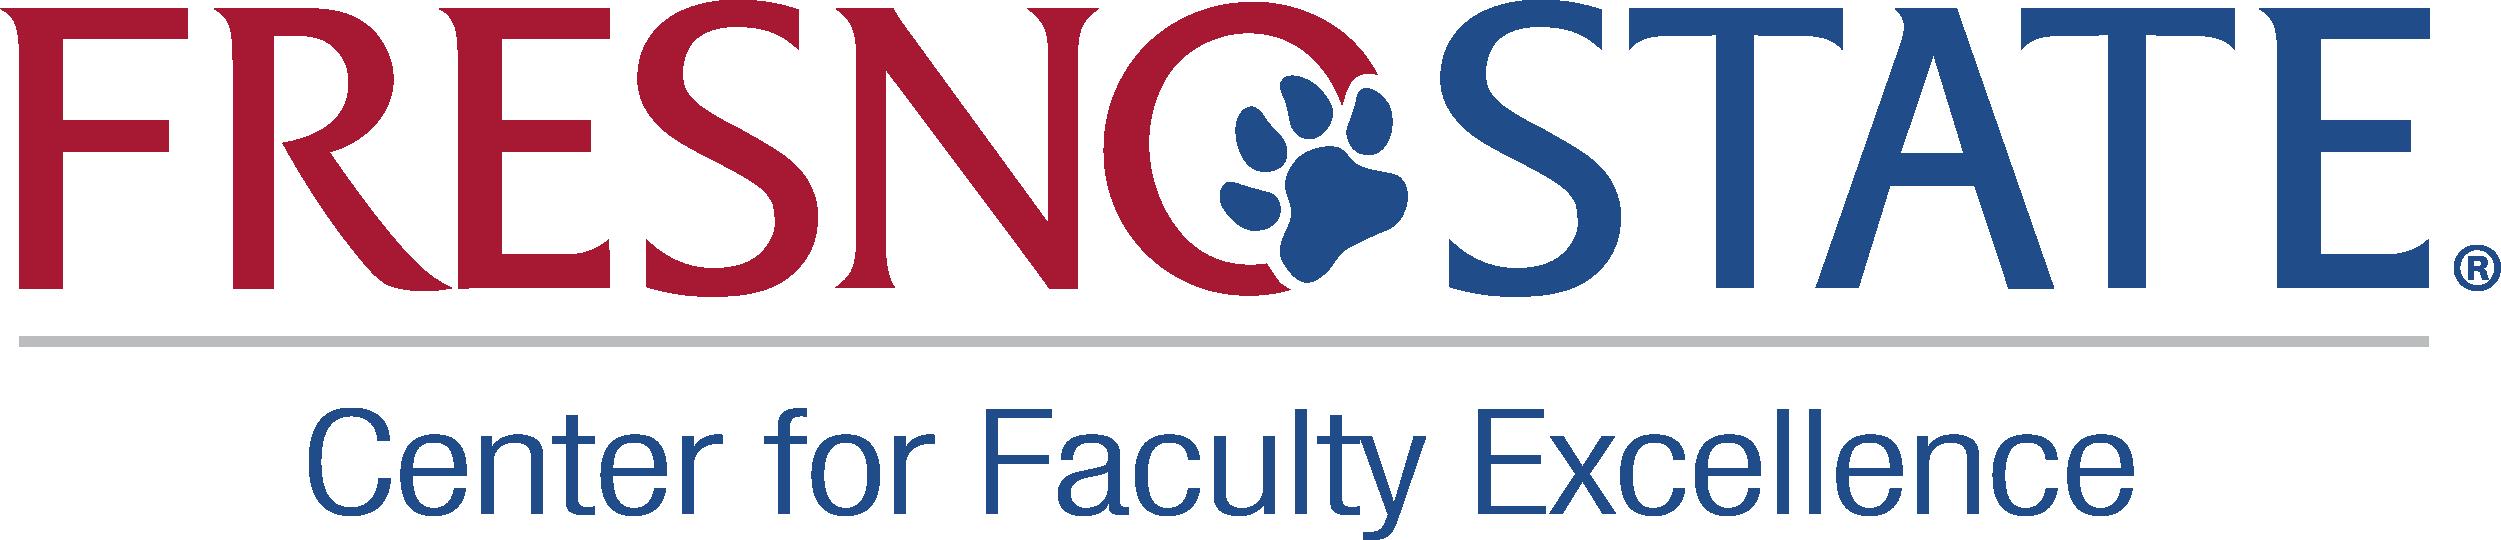 Fresno State Center for Faculty Excellence Logo